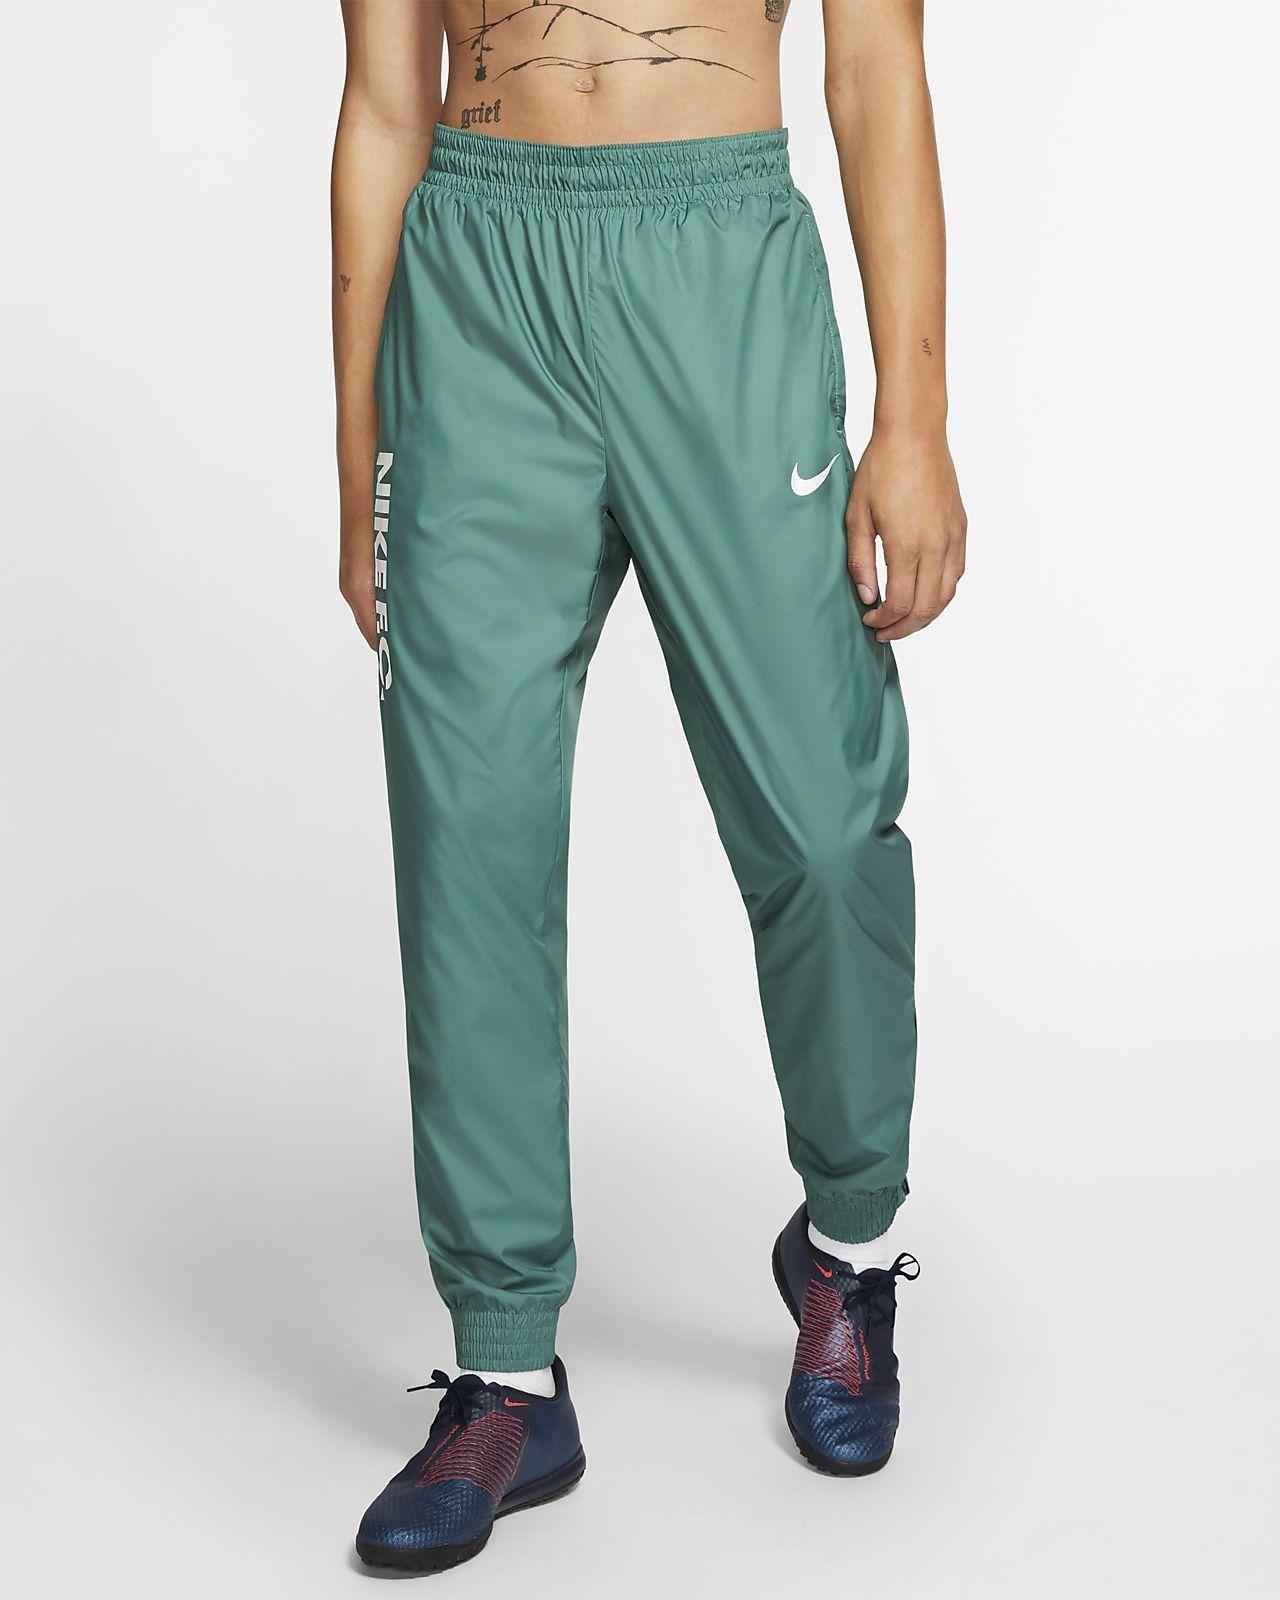 Pantaloni da calcio Nike F.C. - Uomo